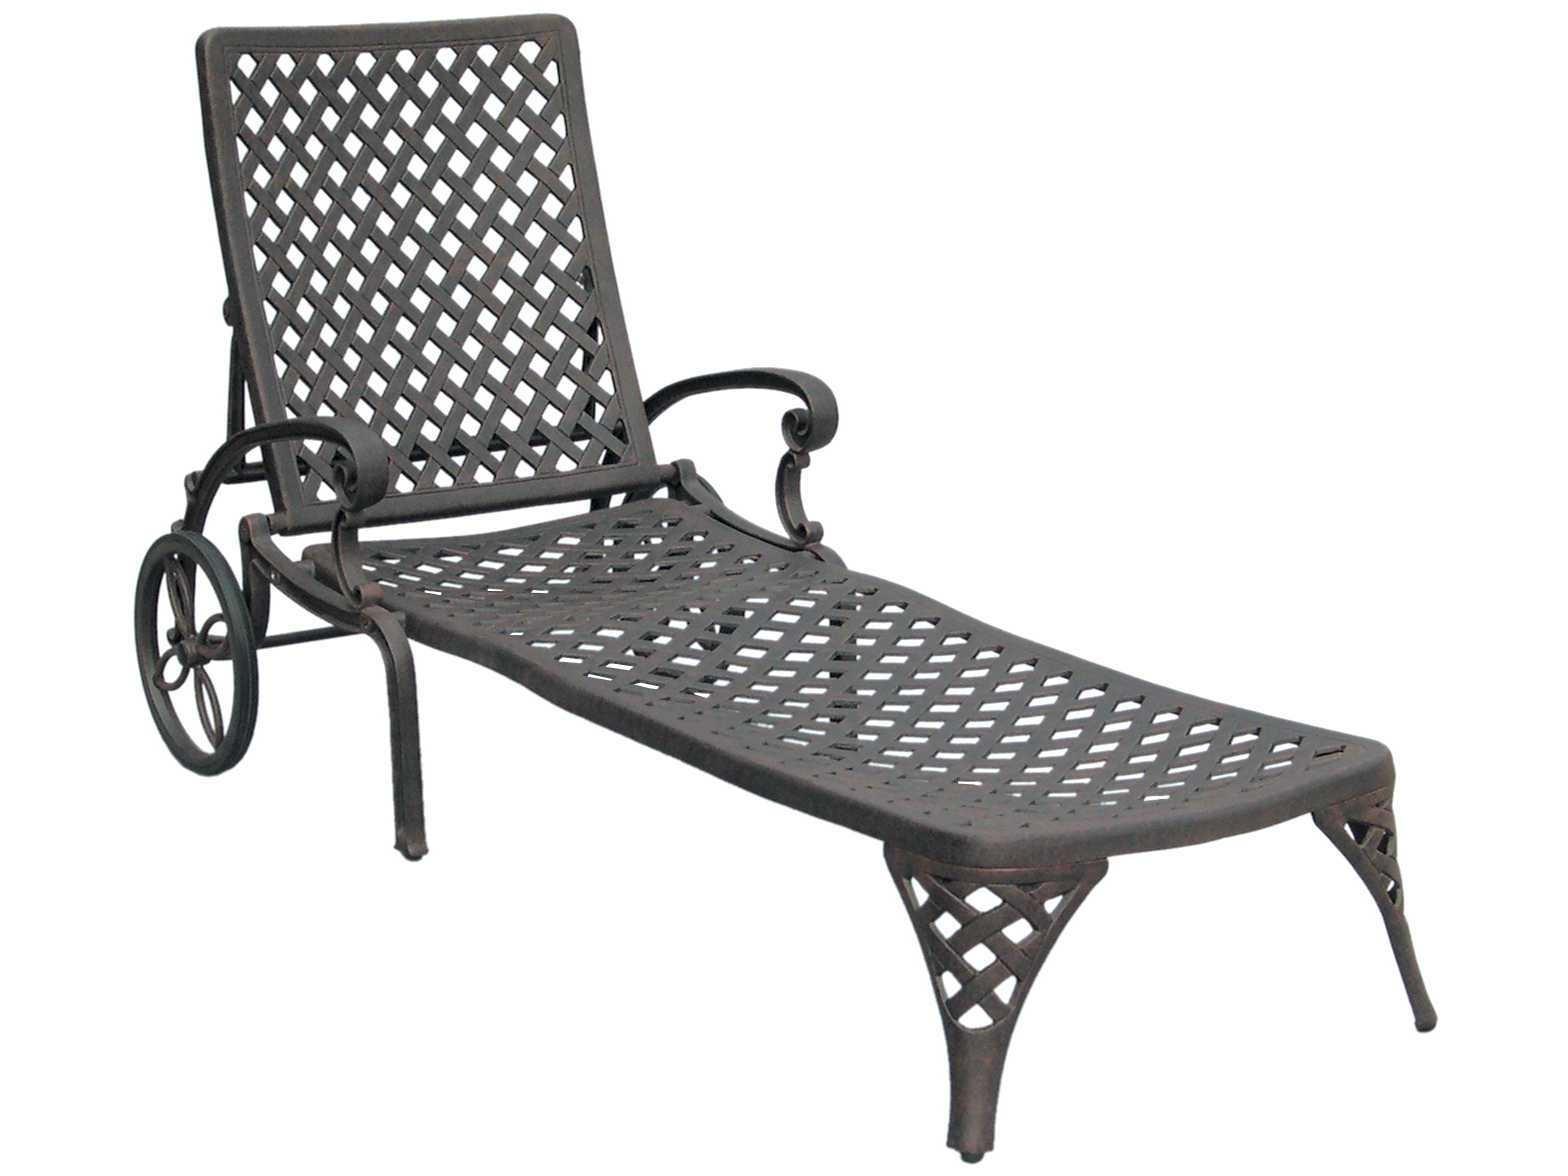 2017 Outdoor Cast Aluminum Chaise Lounge Chairs Regarding Darlee Outdoor Living Standard Nassau Cast Aluminum Antique Bronze (View 3 of 15)